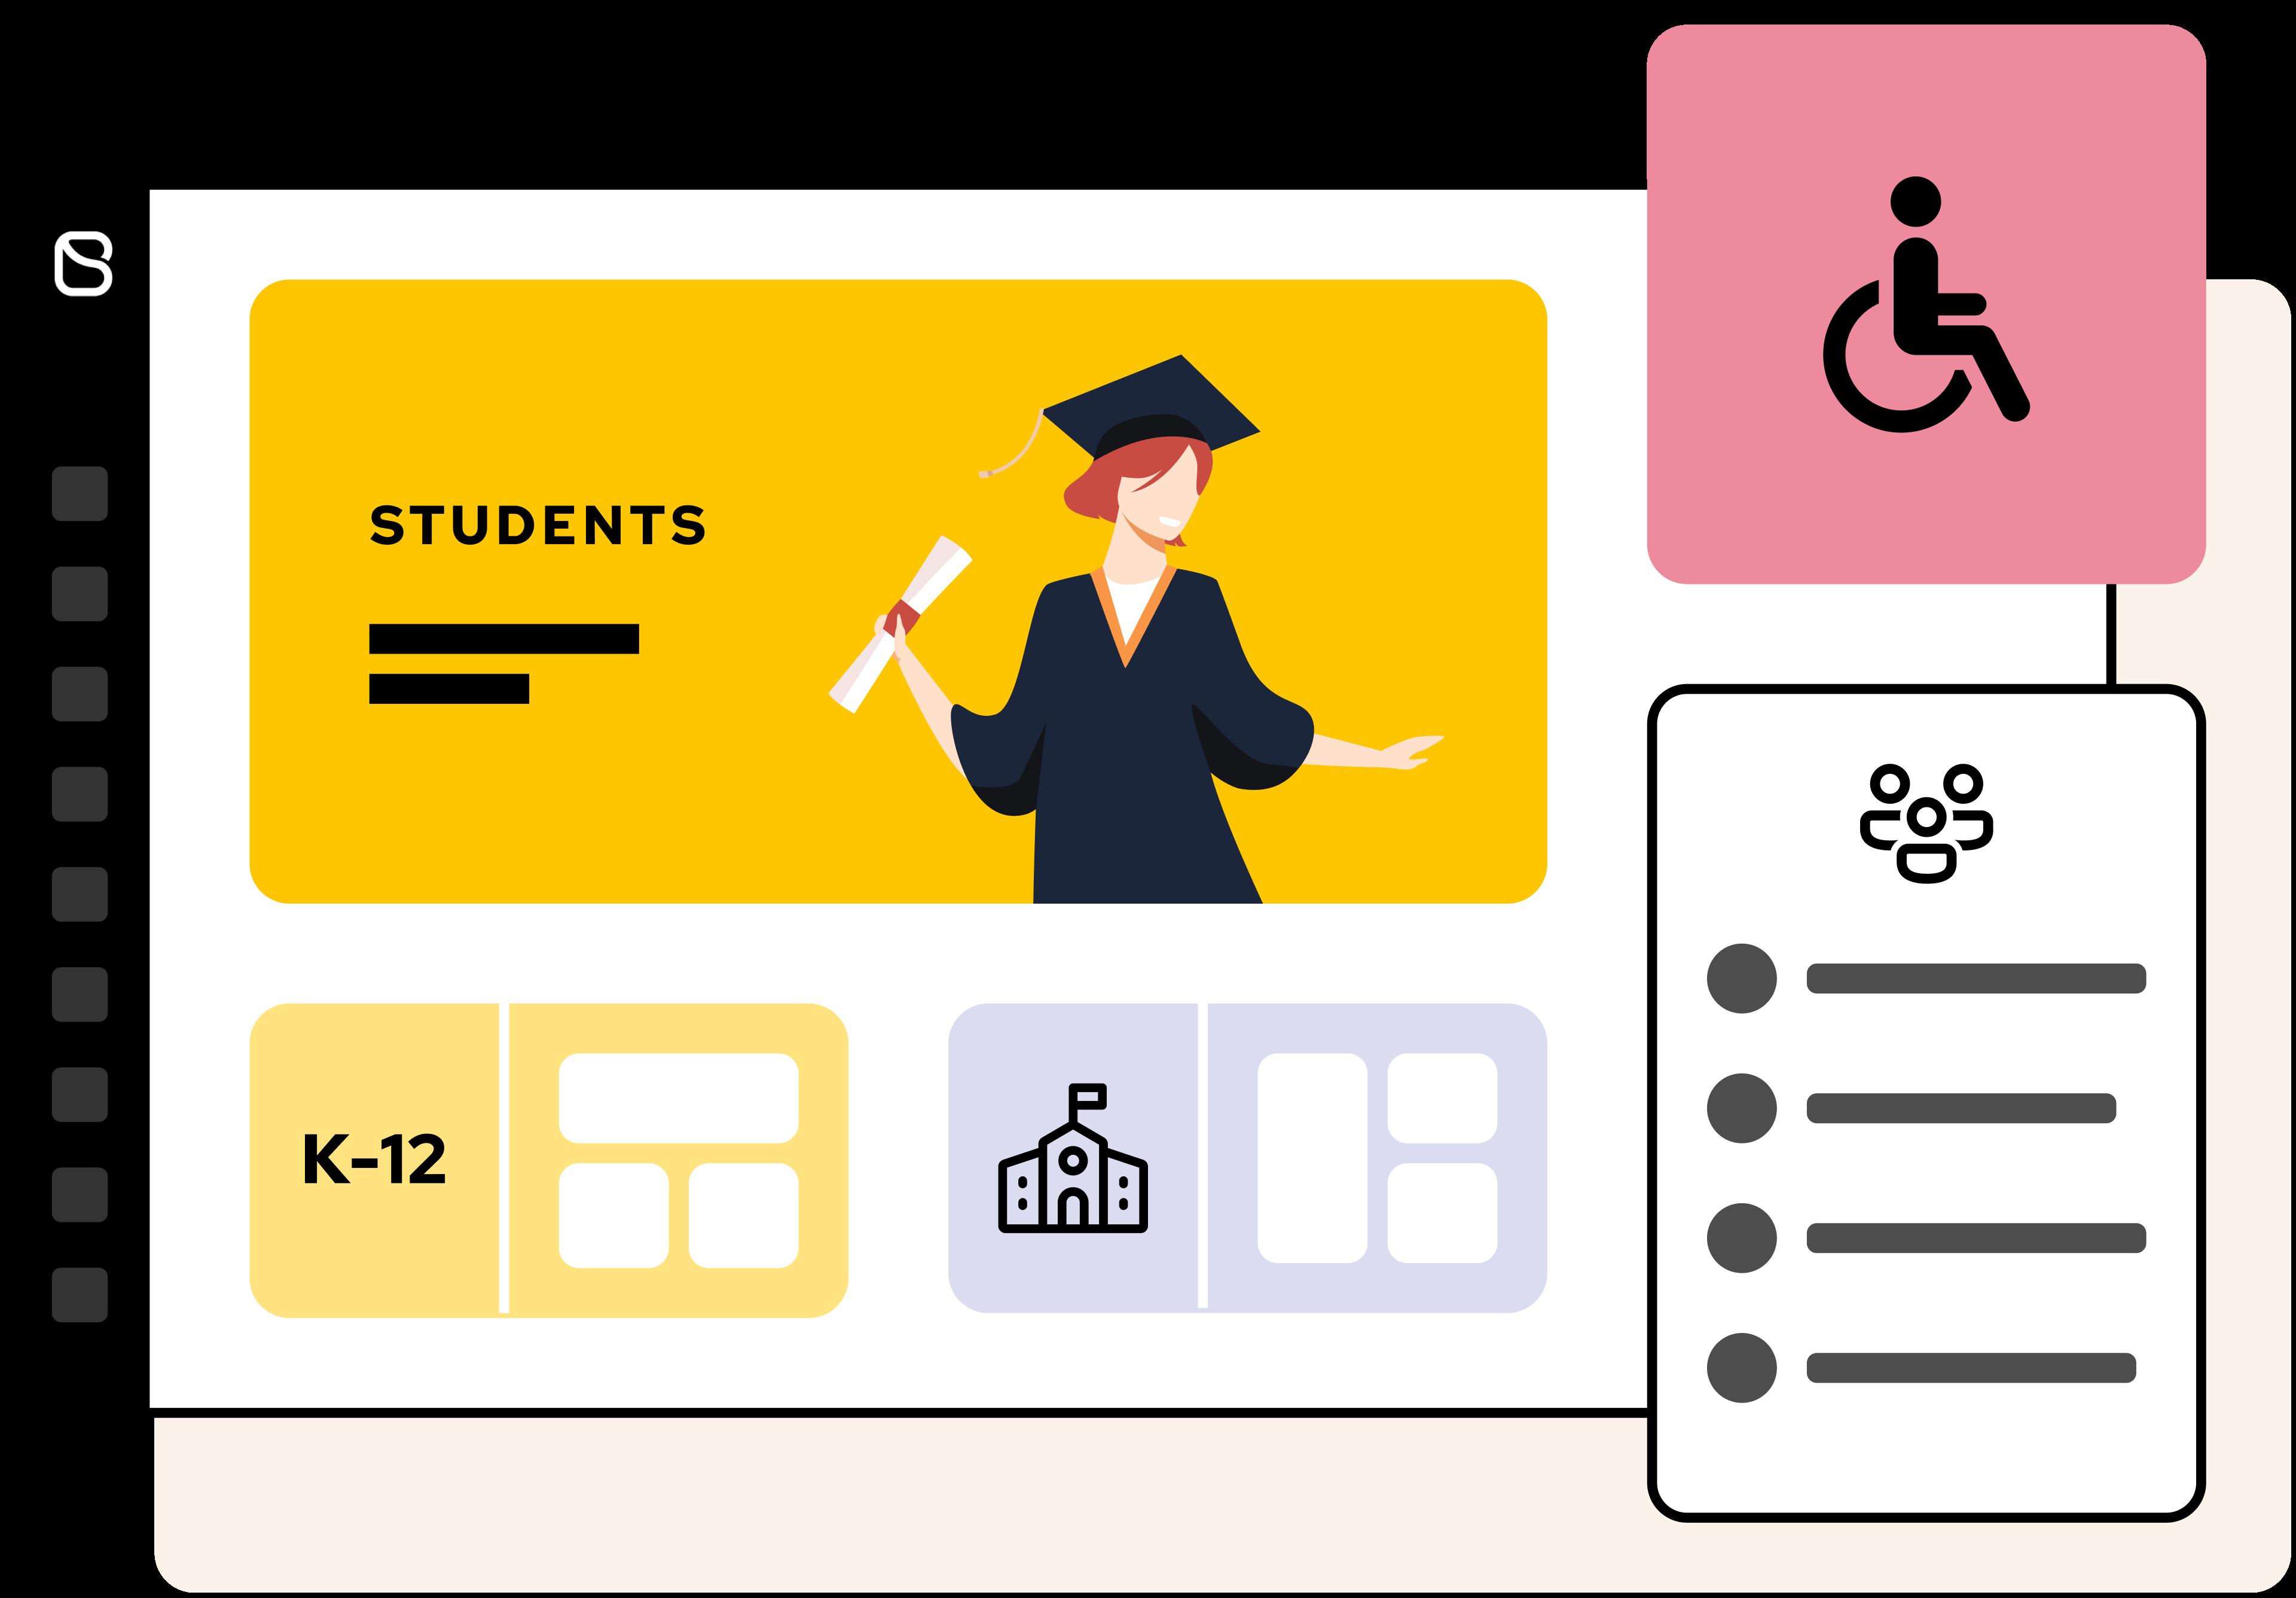 Students digital workspace